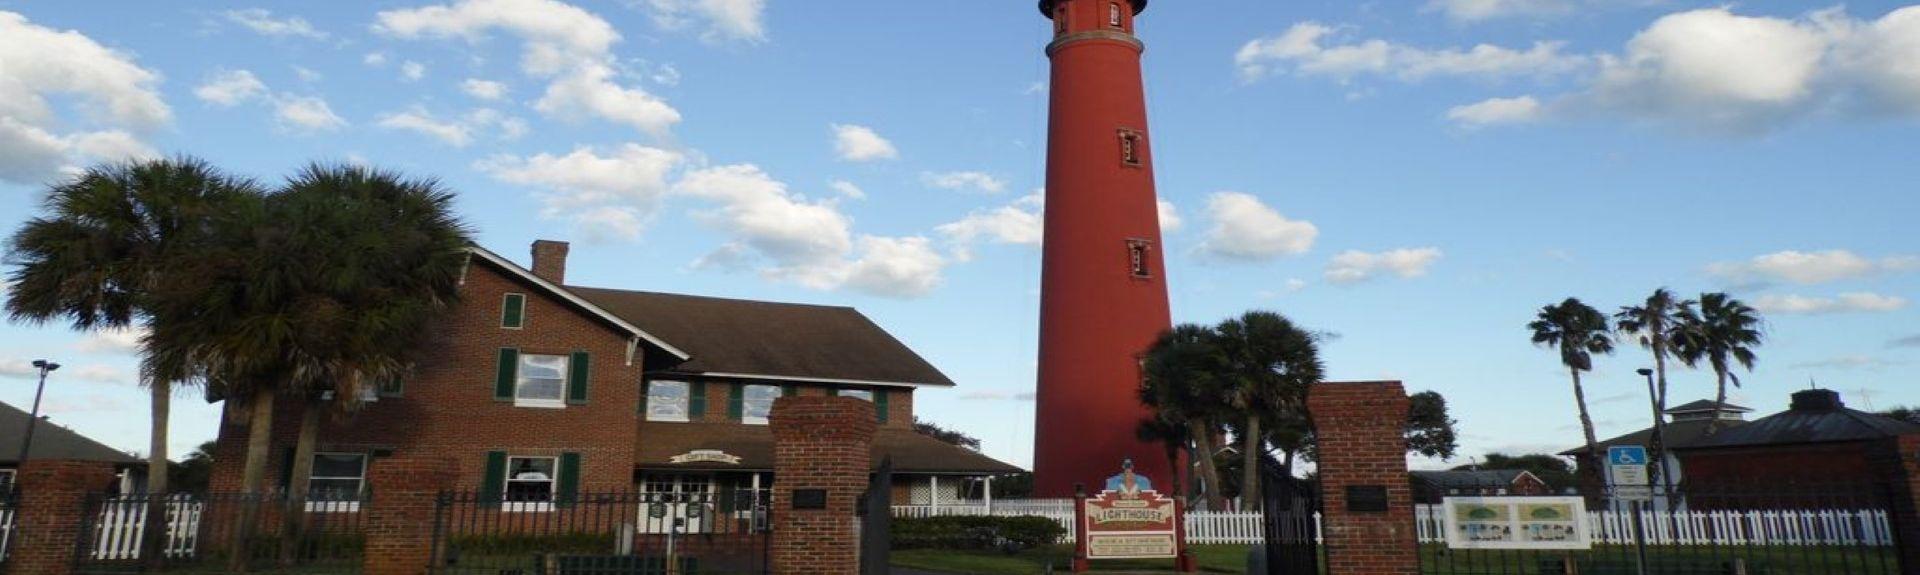 Callalisa Park, New Smyrna Beach, Florida, Verenigde Staten